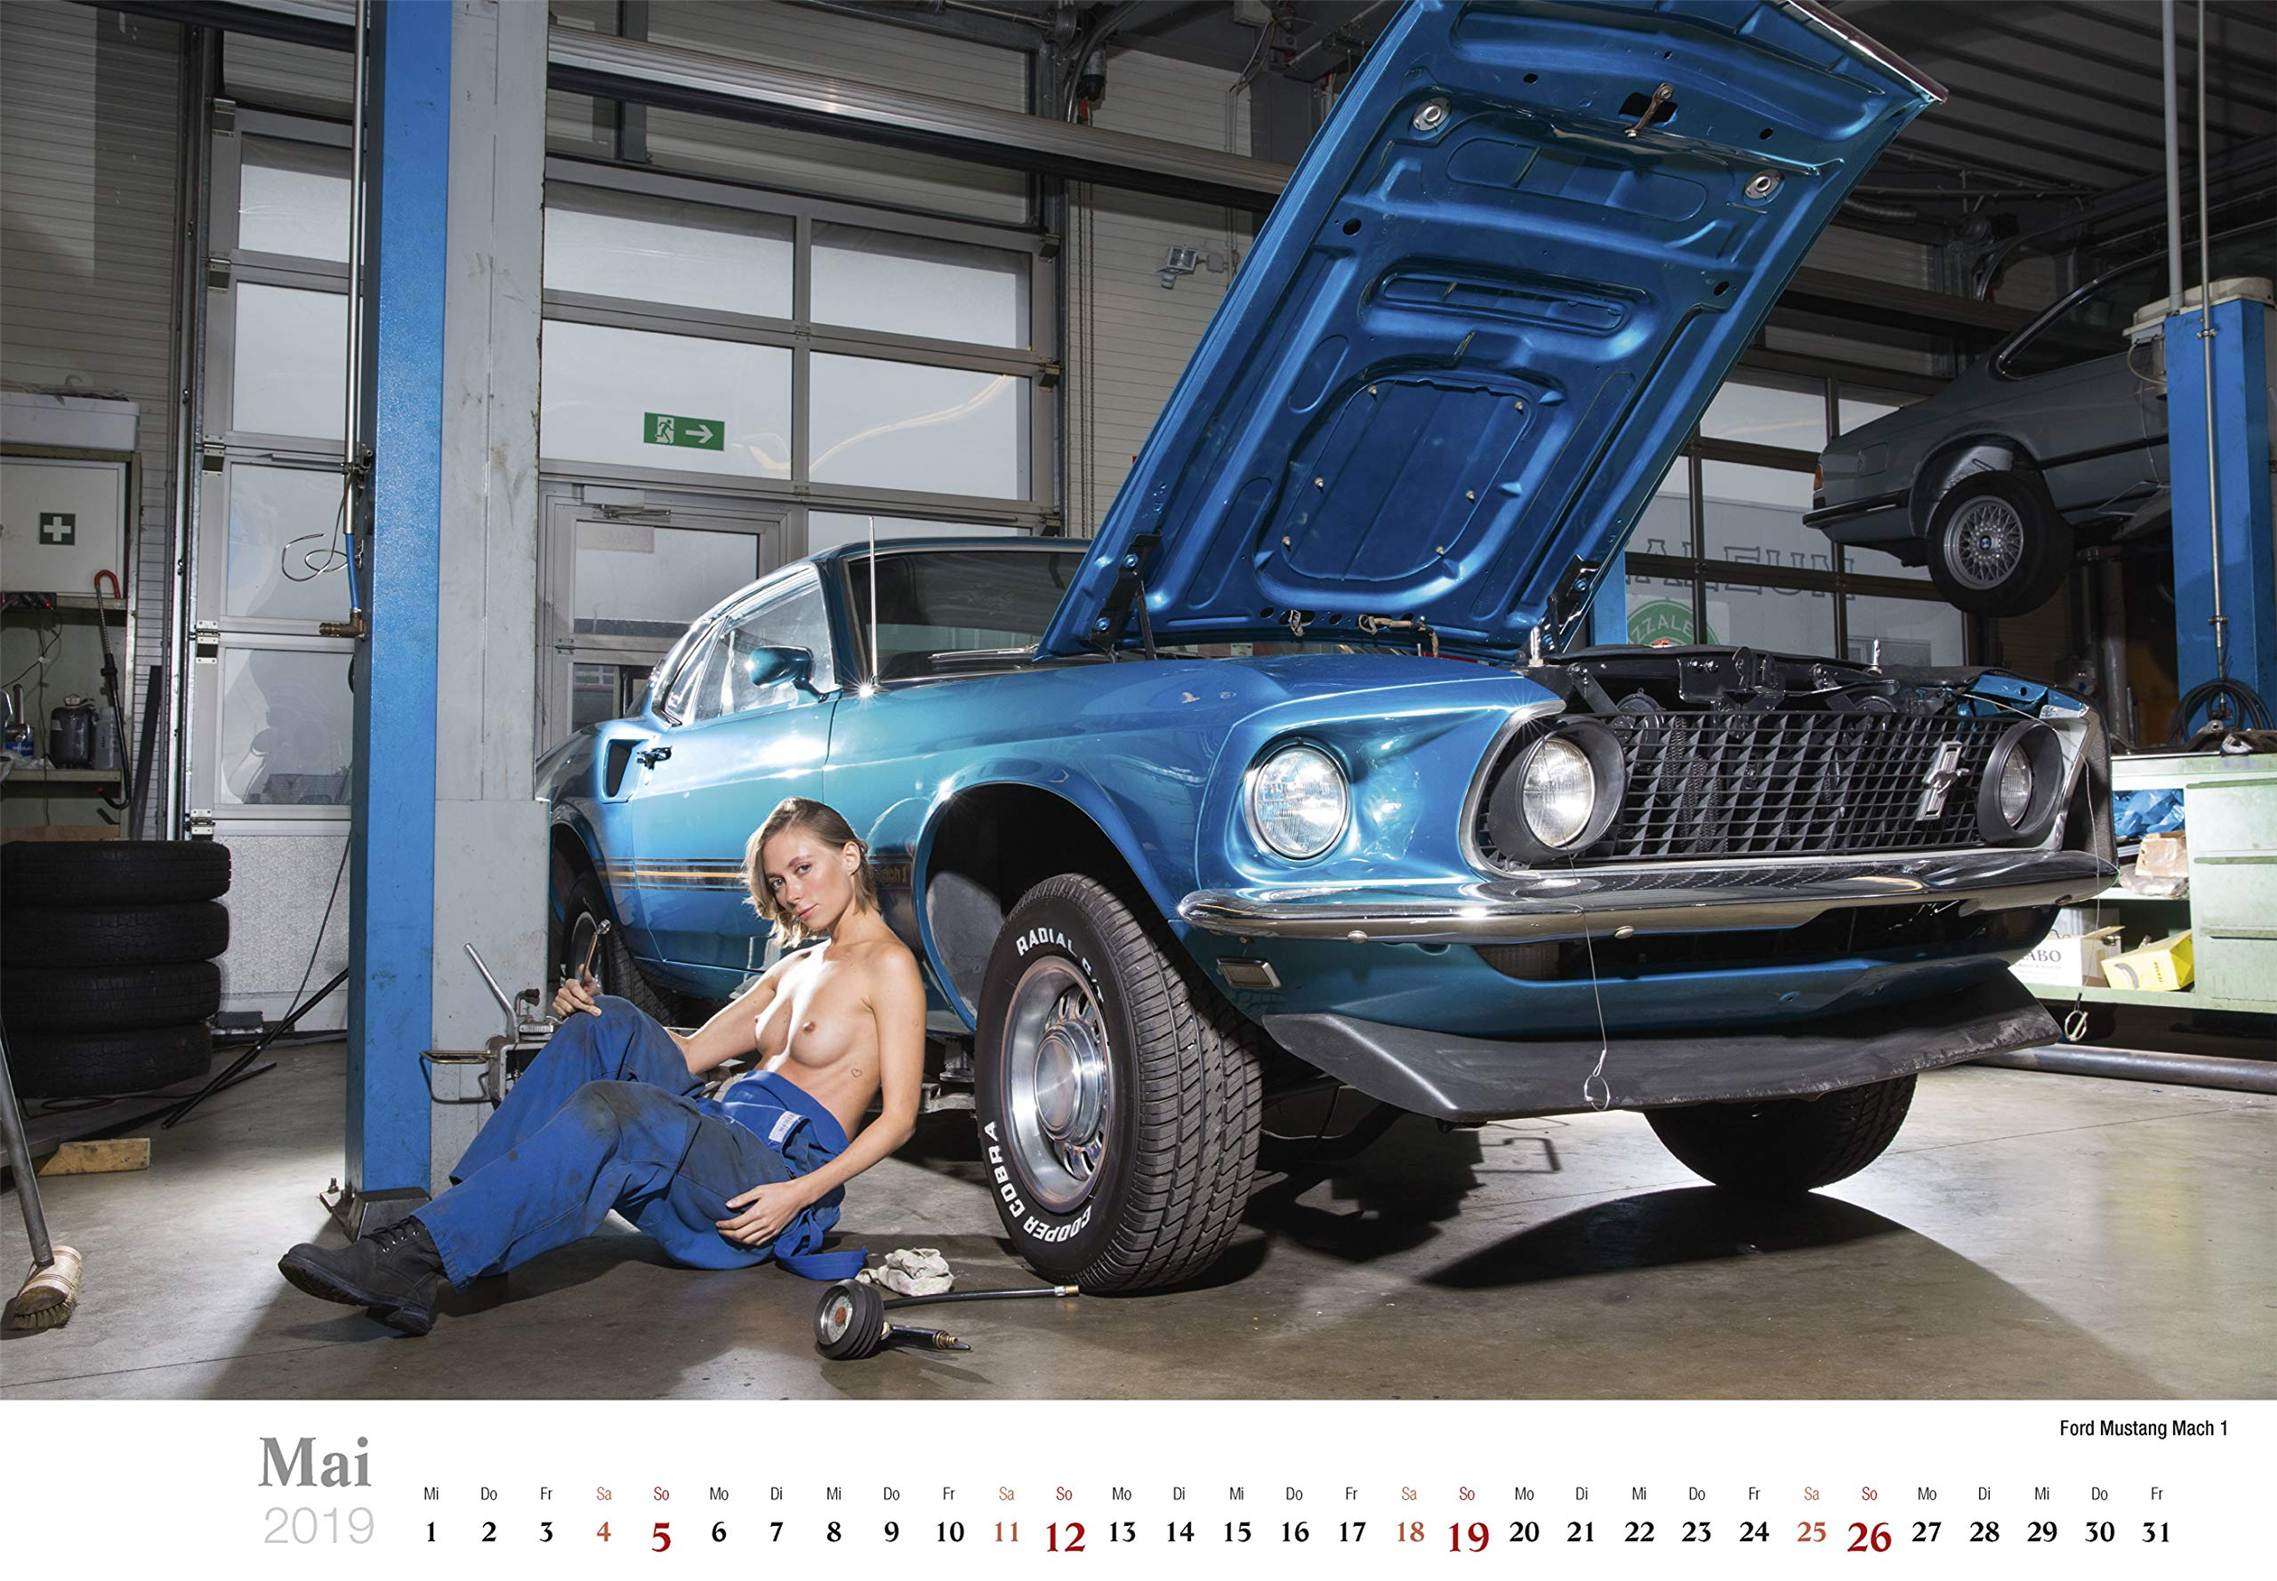 Сексуальные девушки ремонтируют автомобили / Ford Mustang Mach 1 / Schraubertraume / 2019 erotic calendar by Frank Lutzeback